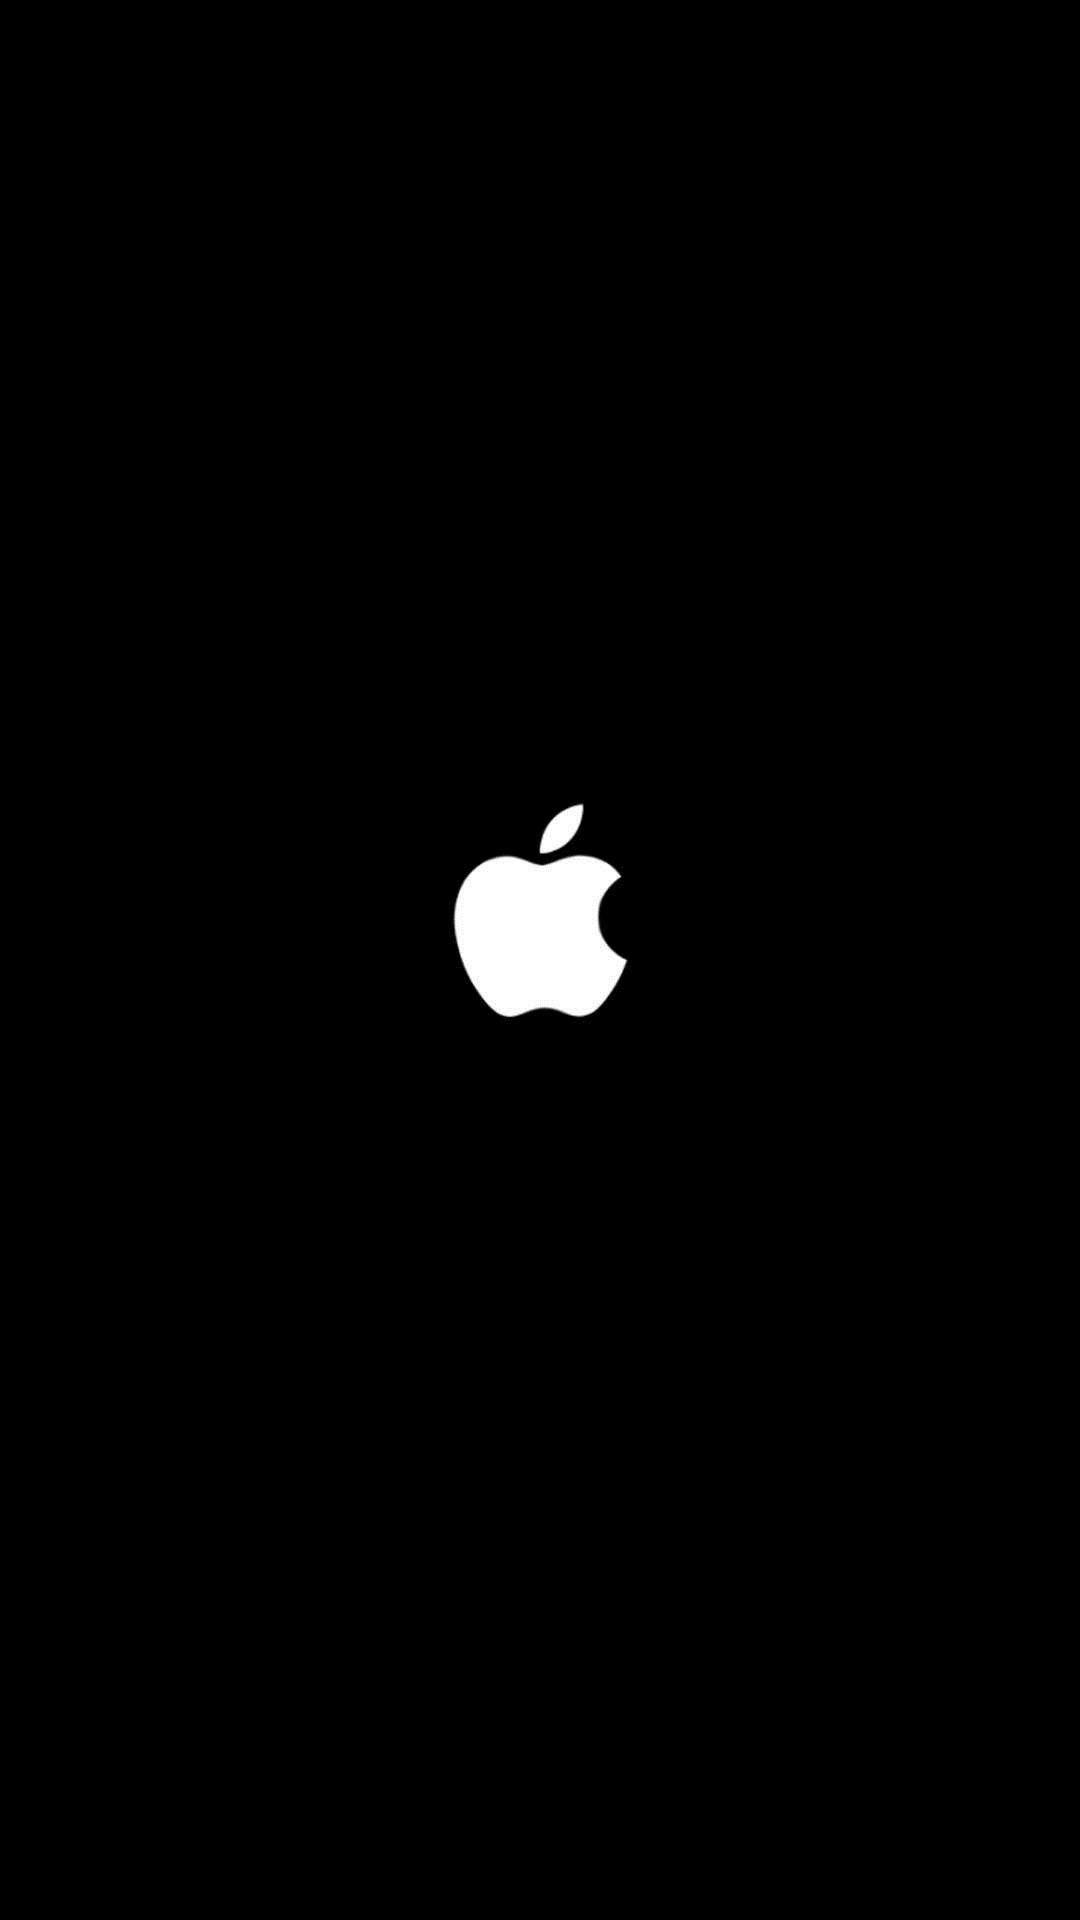 Logo iPhone hd wallpaper